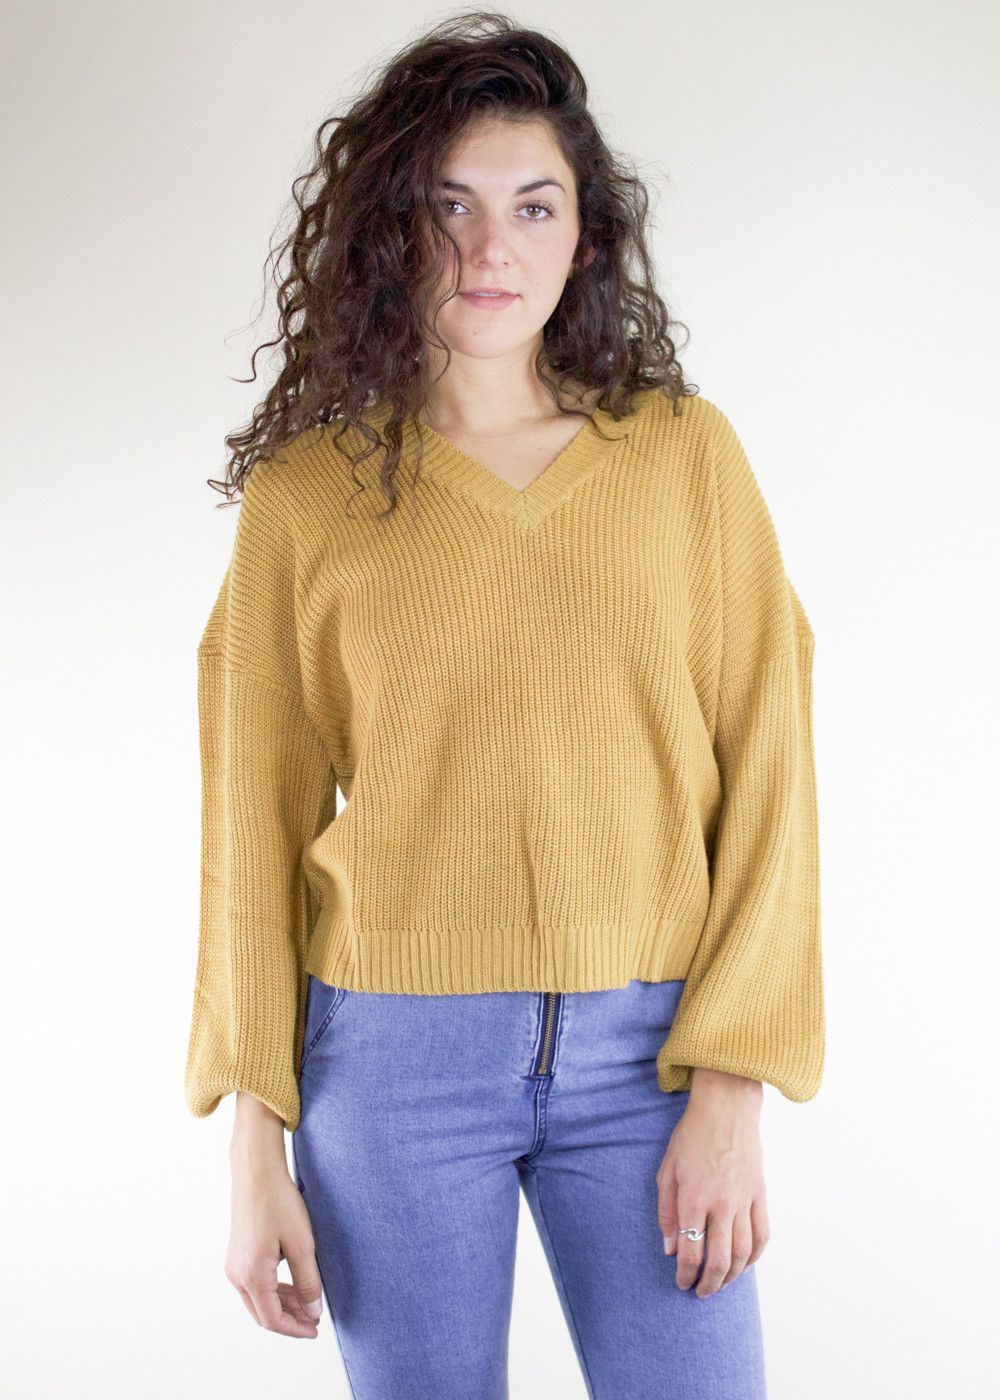 Honey Jam Knit Sweater